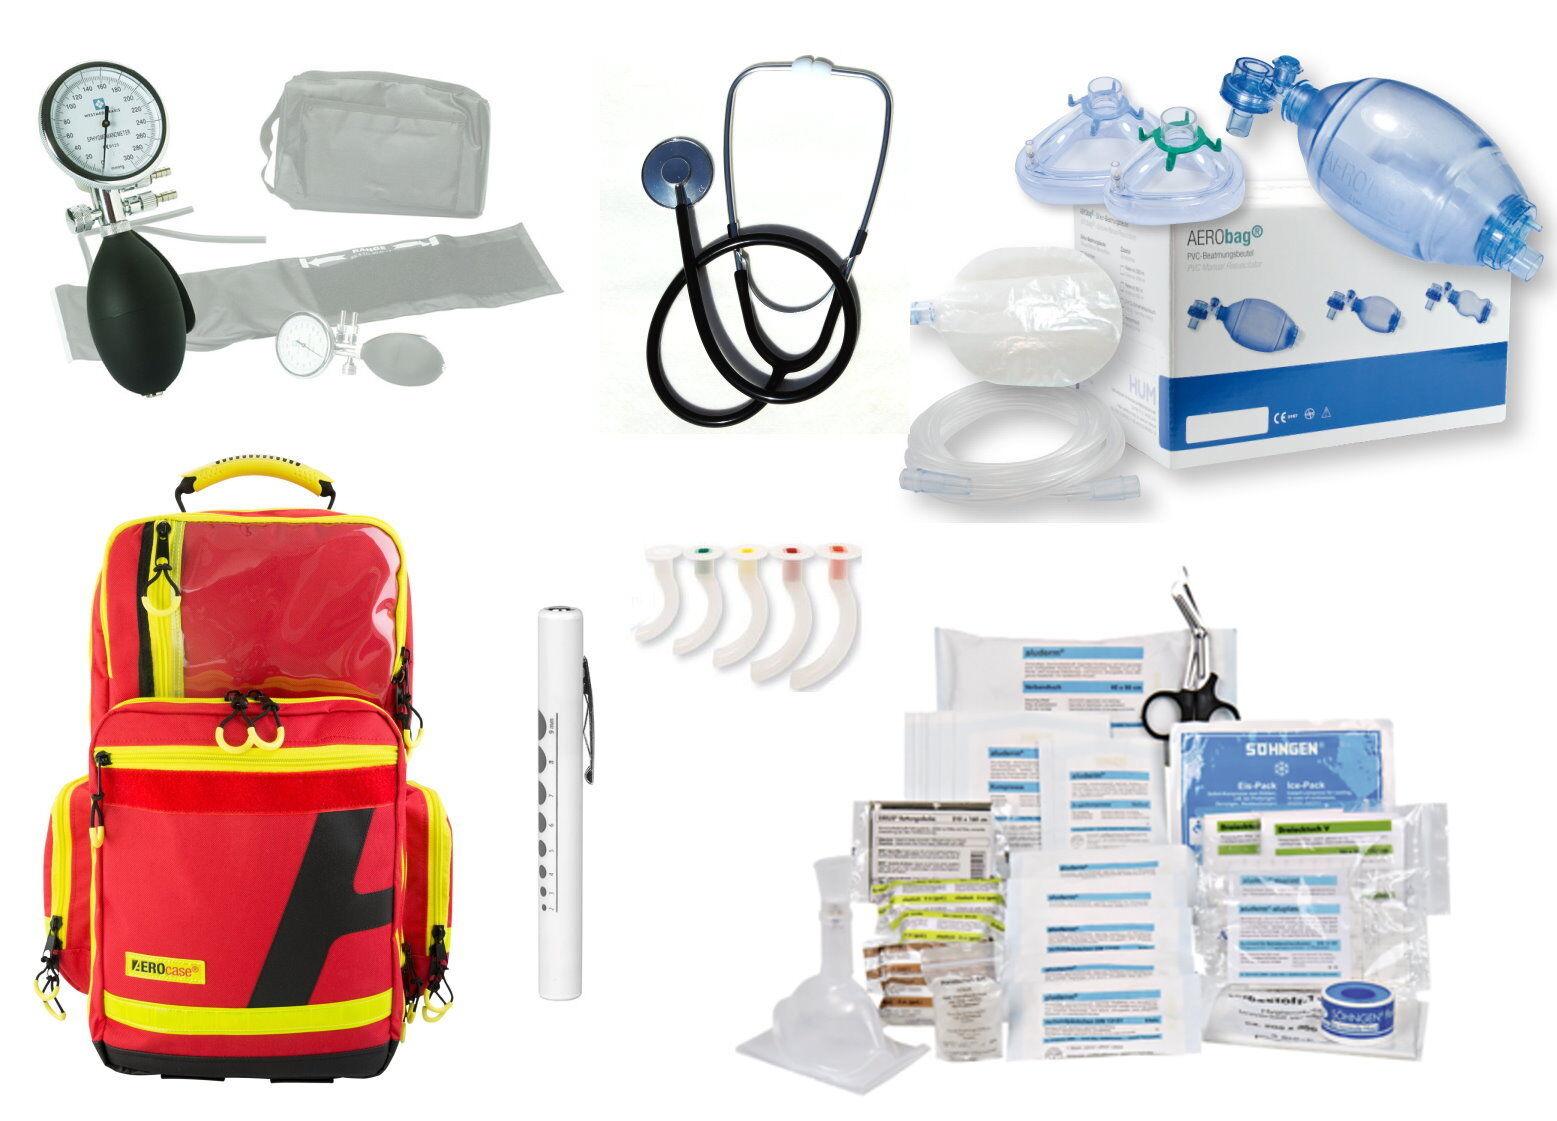 Notfallrucksack AEROcase RPL gefüllt MED-Söhngen (ArztPraxis Feuerwehr DIN 13157